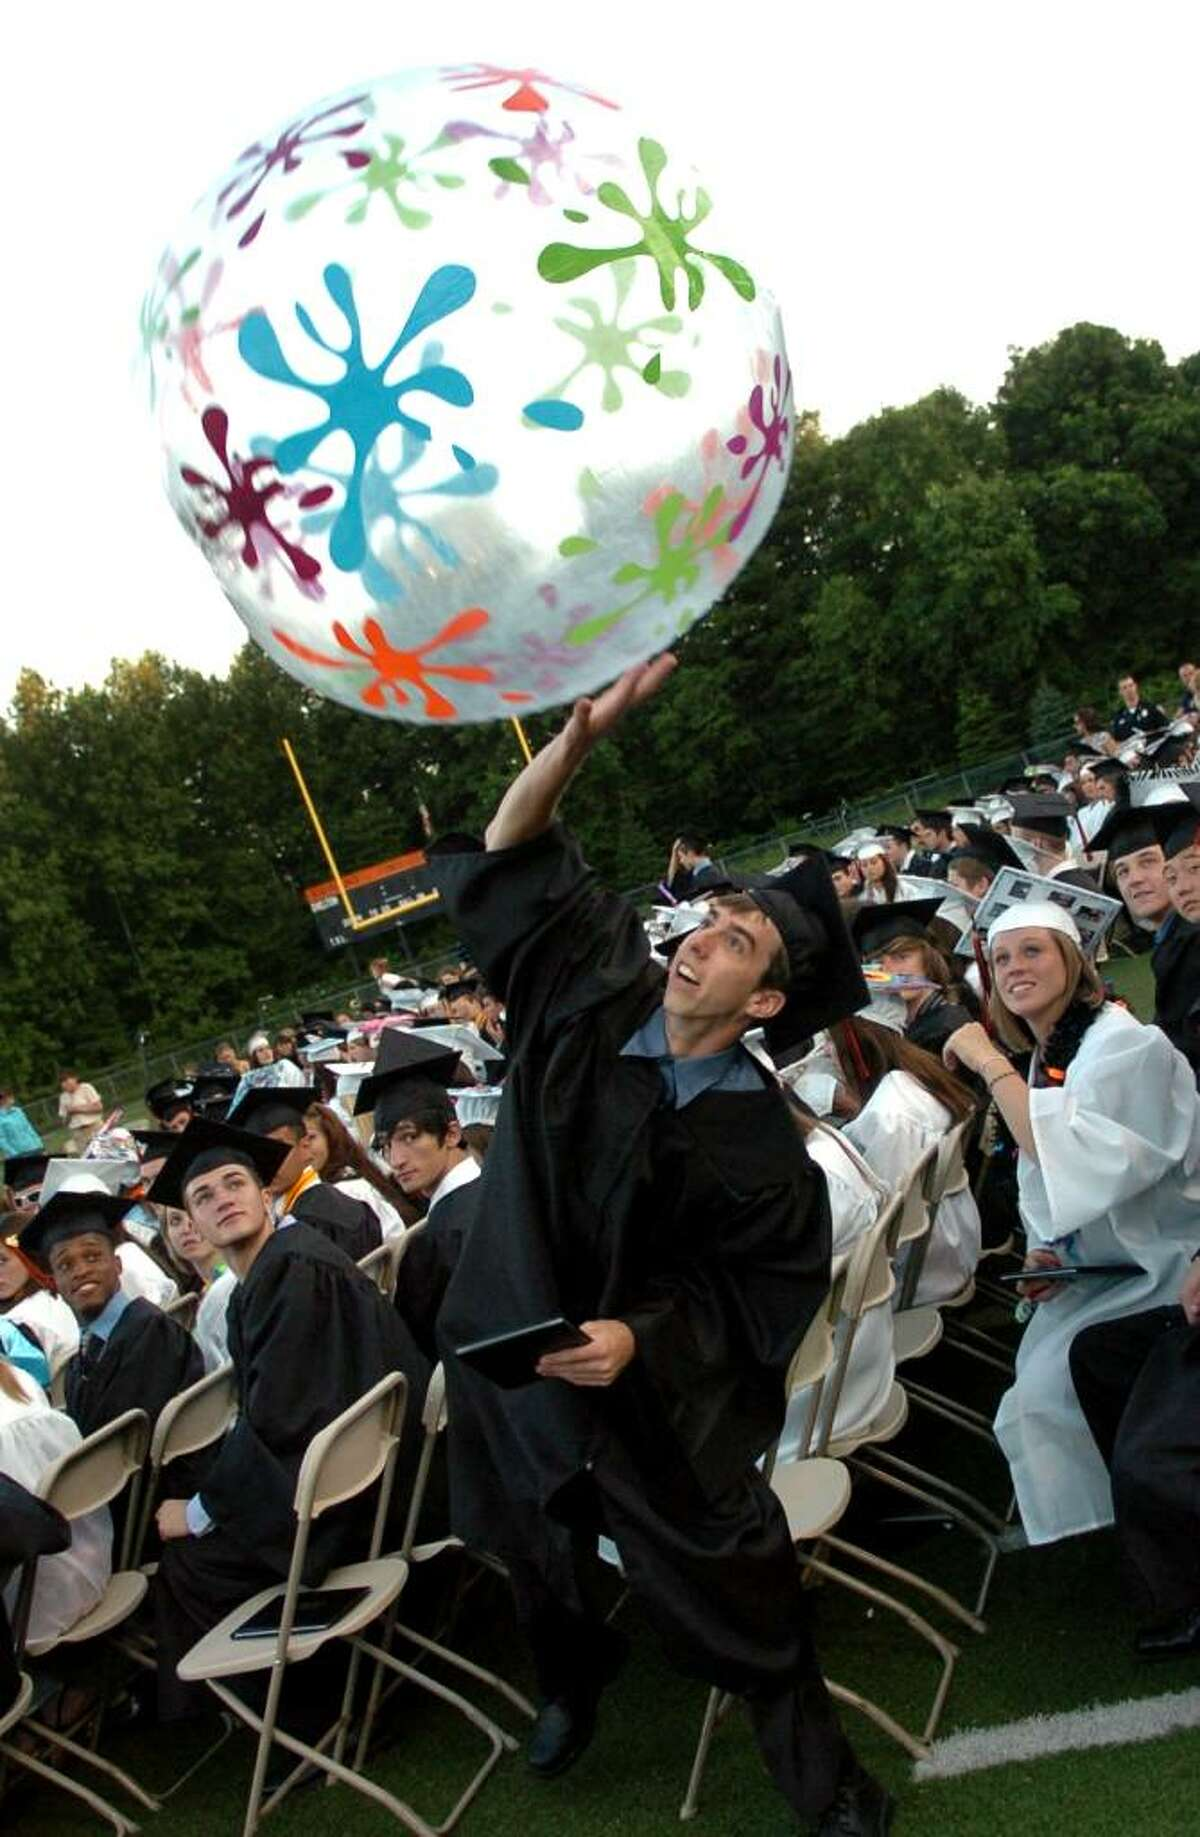 Graduate Nicholas Mavilla swats a big beach ball into the air, during Shelton High School's Graduation Exercises in Shelton, Conn. on Friday June 18, 2010.